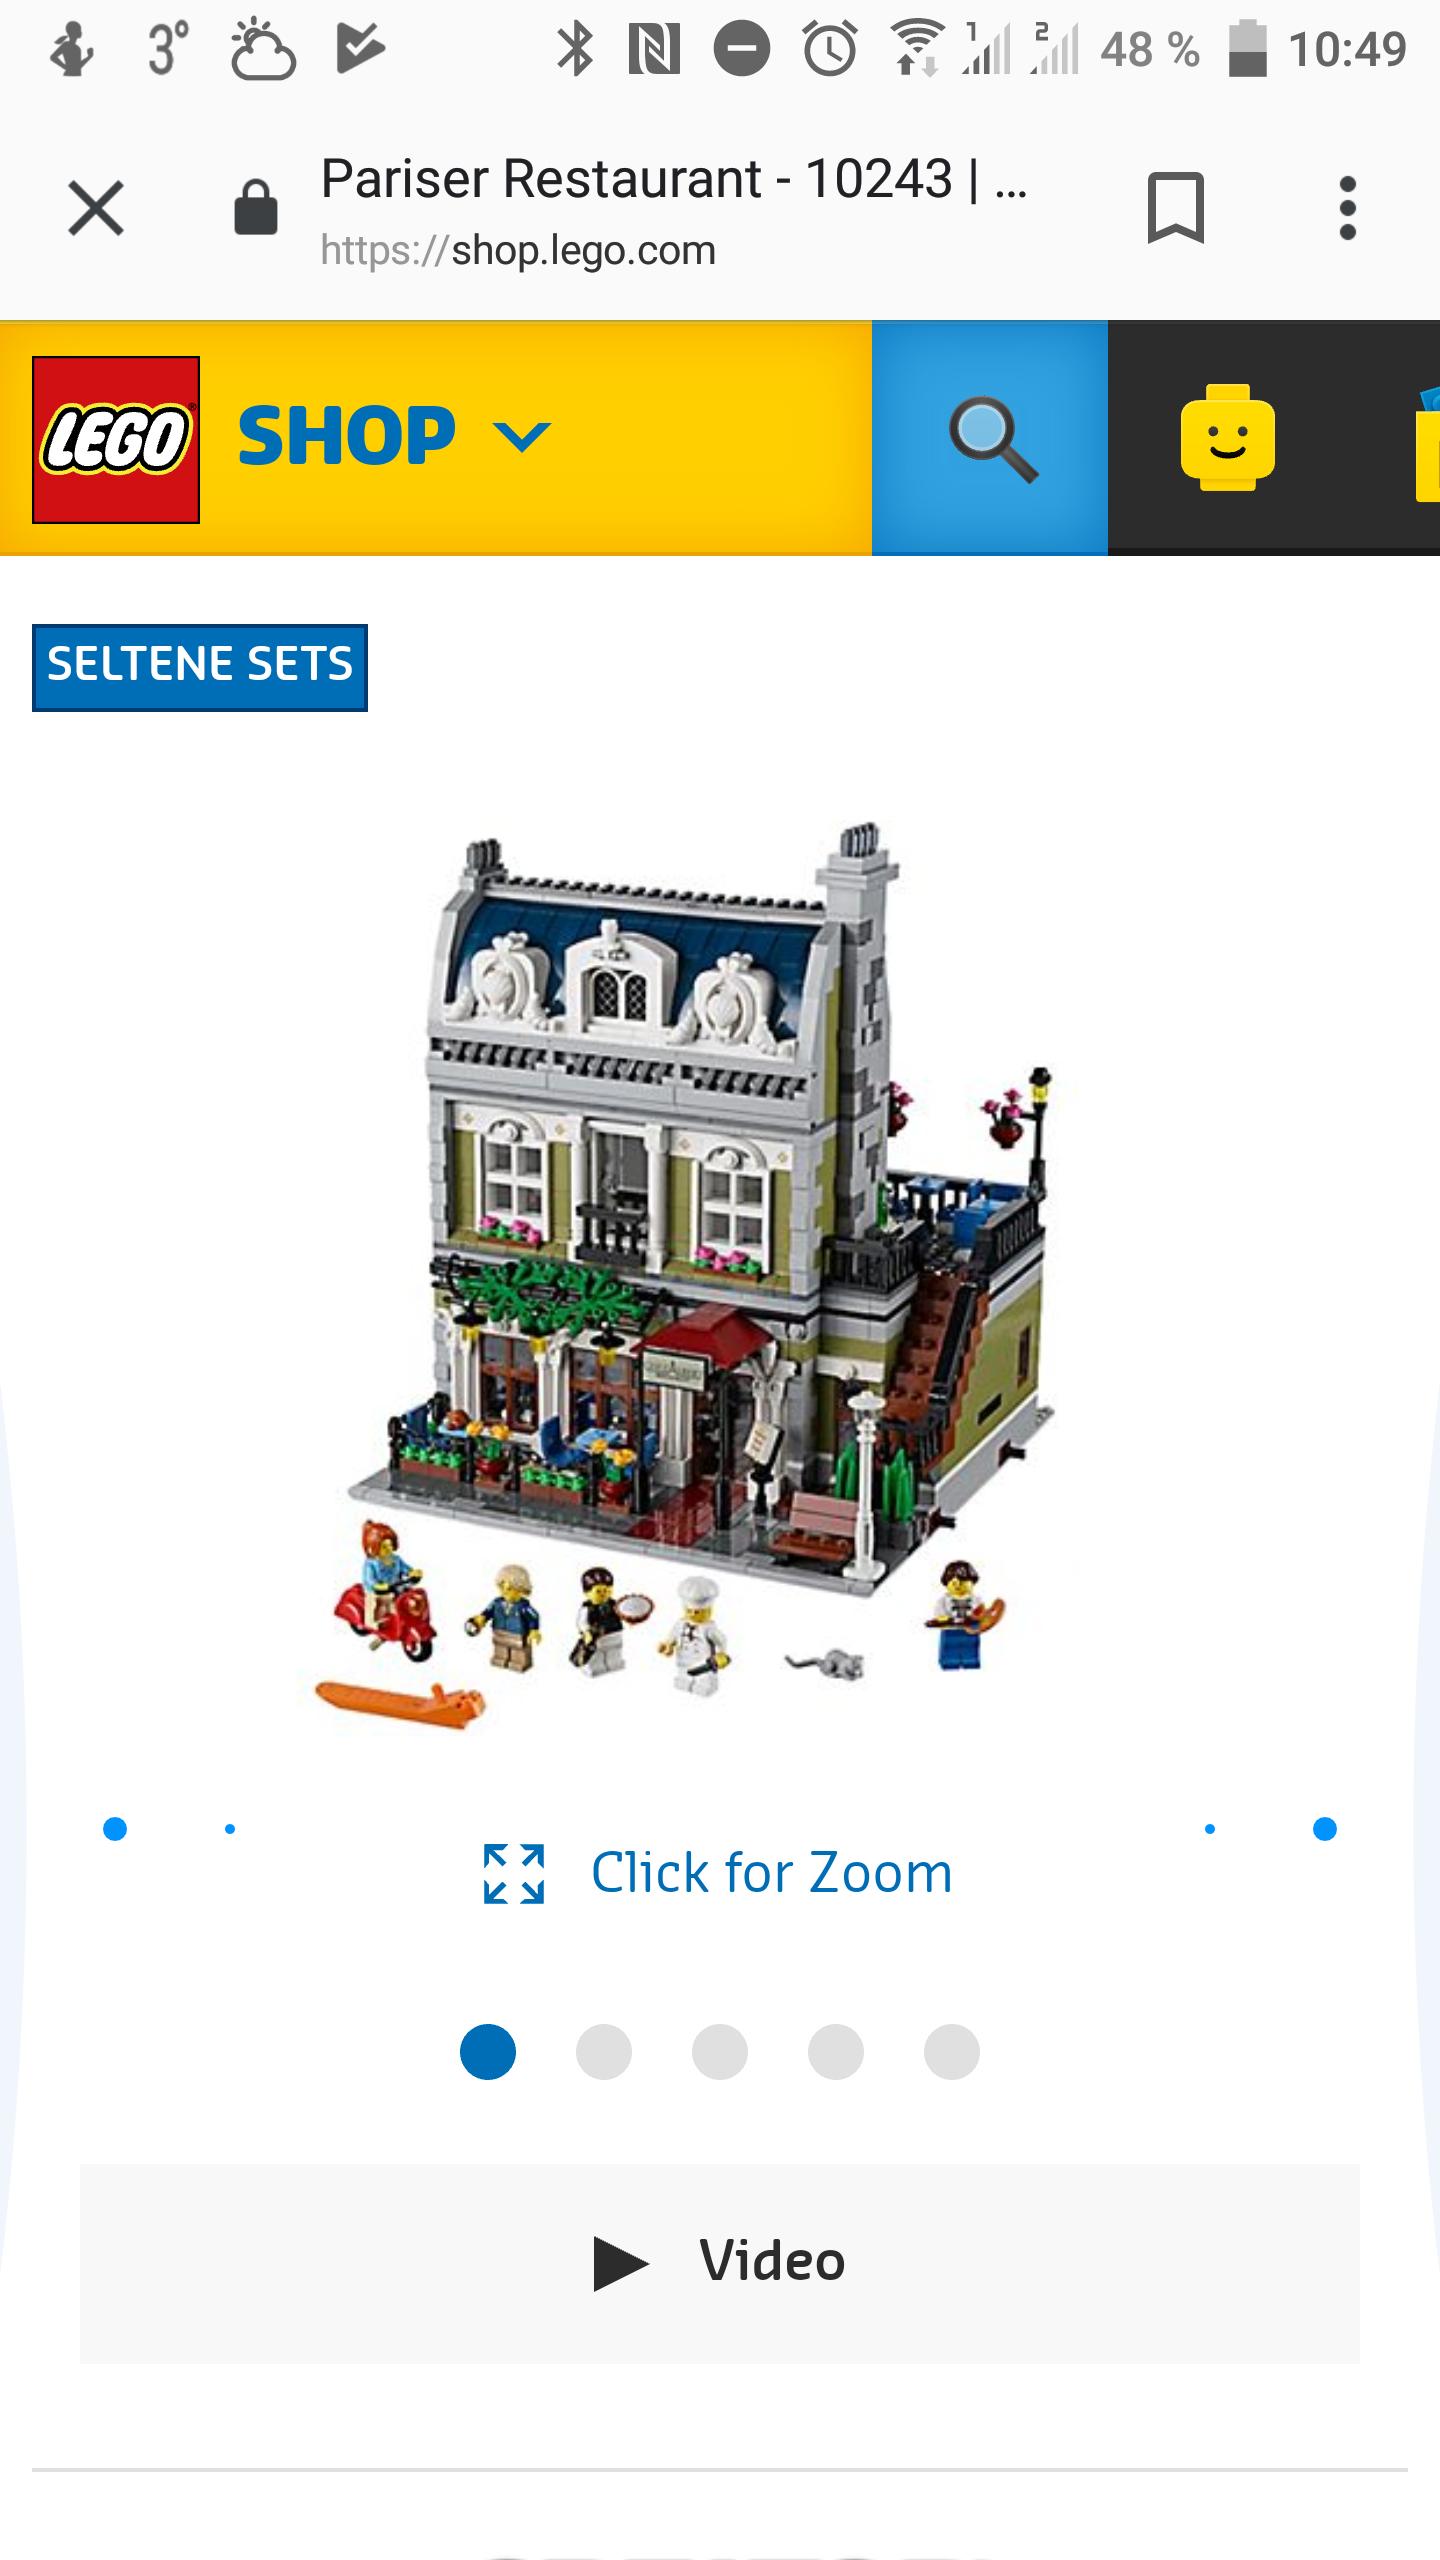 Lego Creator Expert Pariser Restaurant 10243 nachbestellbar